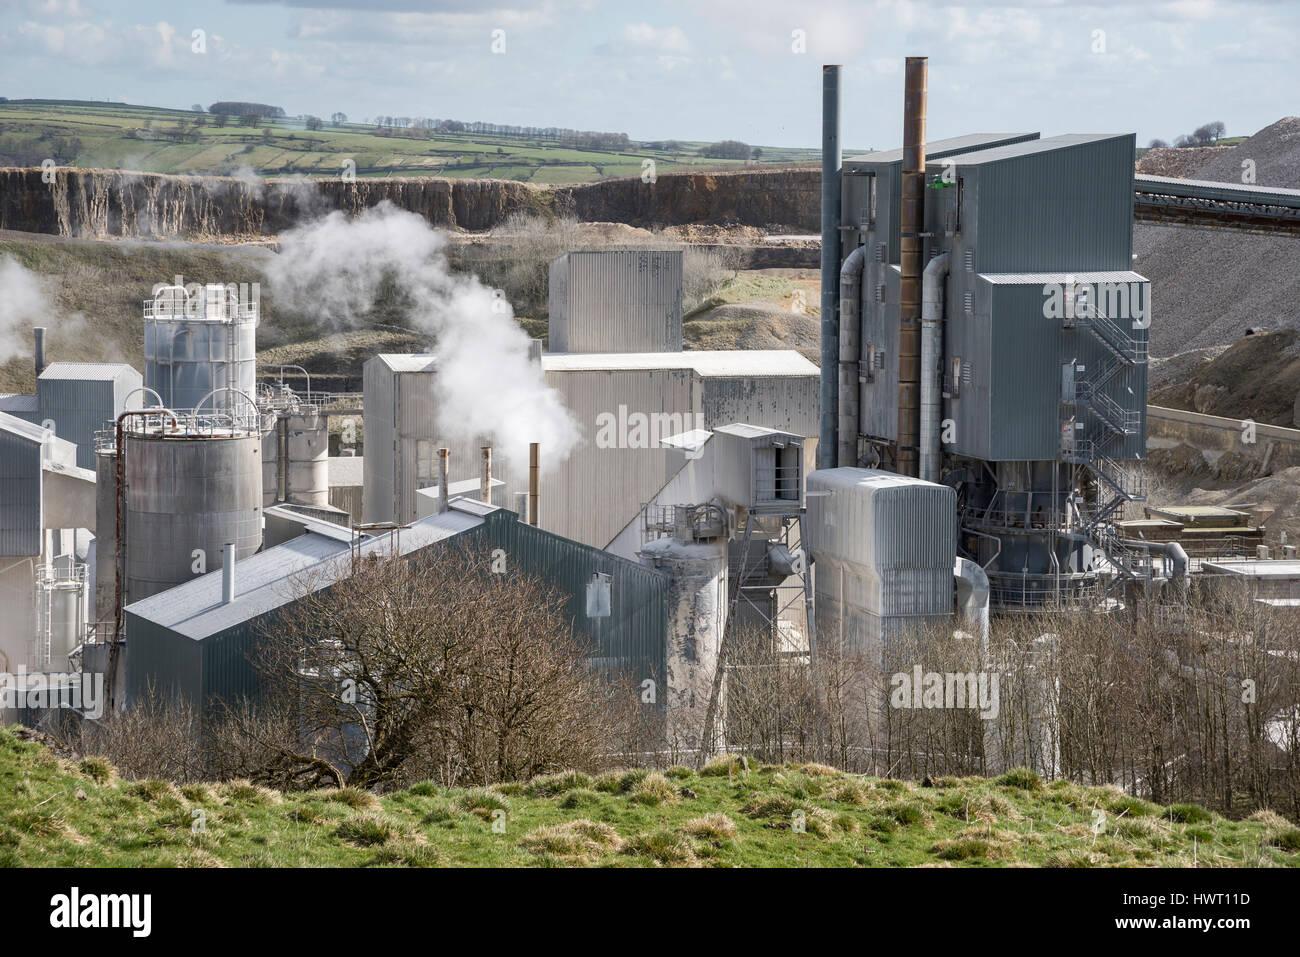 Working limestone quarry near Buxton, Derbyshire, England. - Stock Image